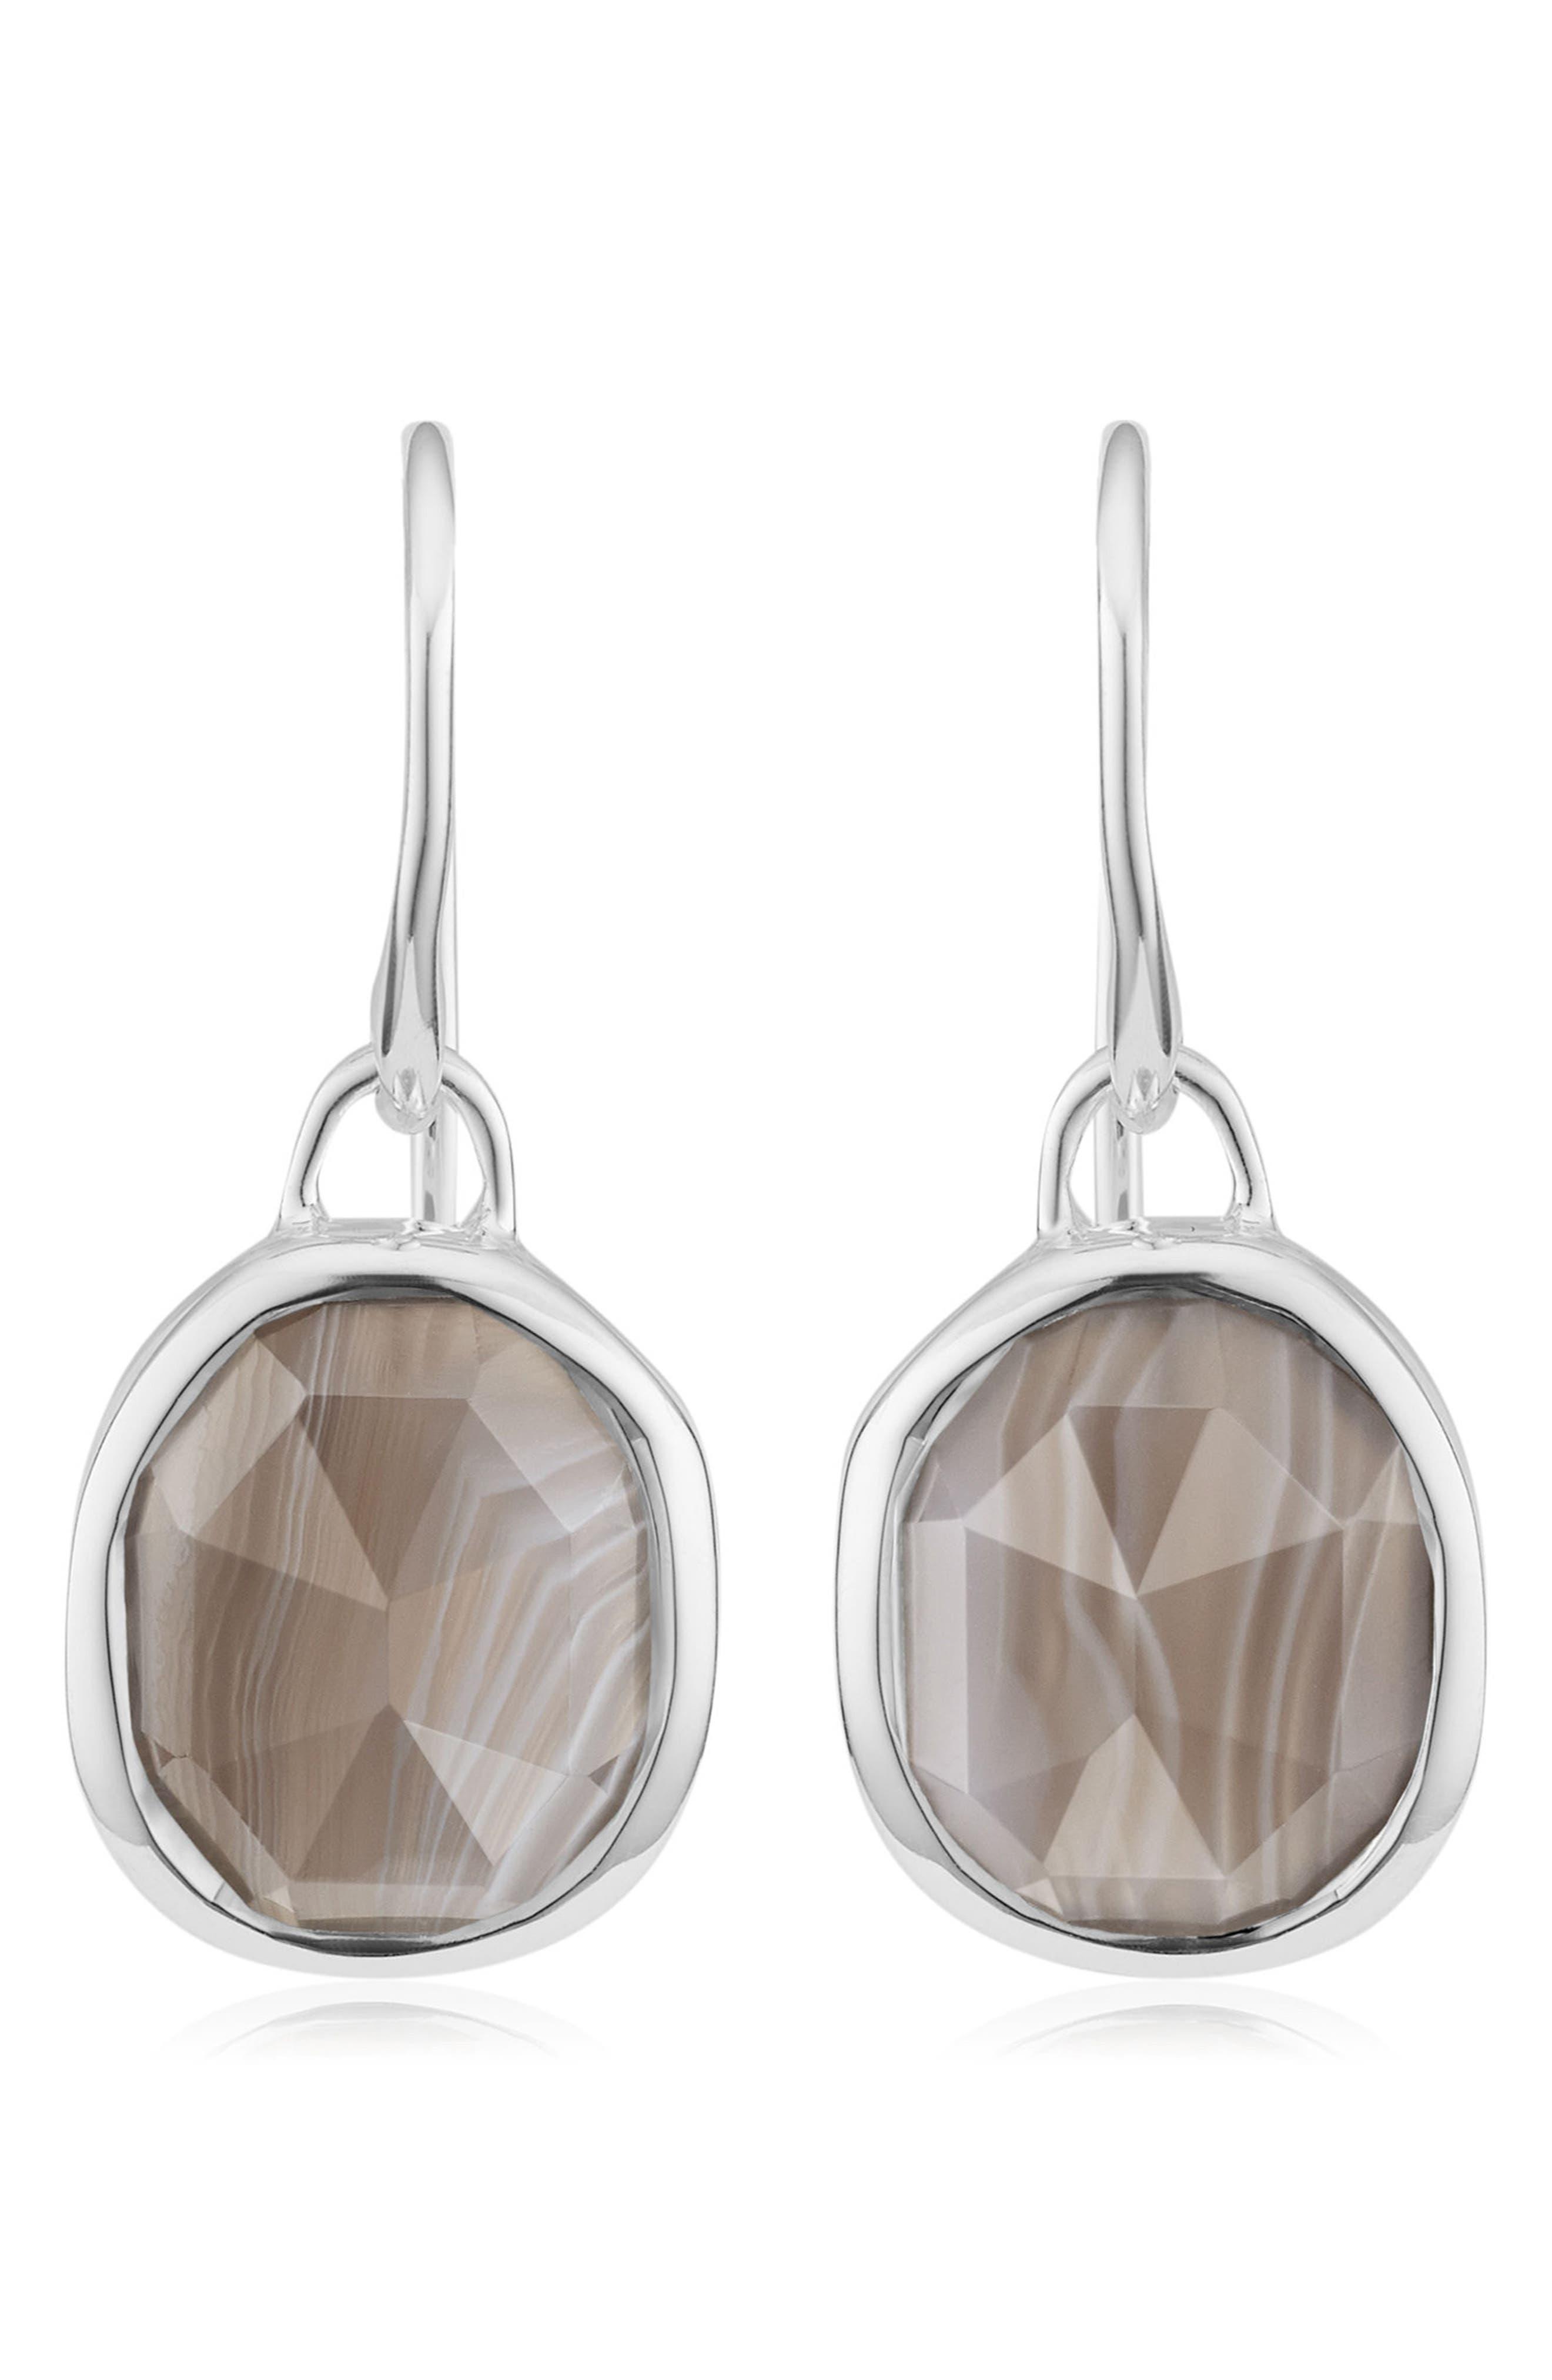 Siren Semiprecious Stone Drop Earrings,                         Main,                         color, SILVER/ GREY AGATE